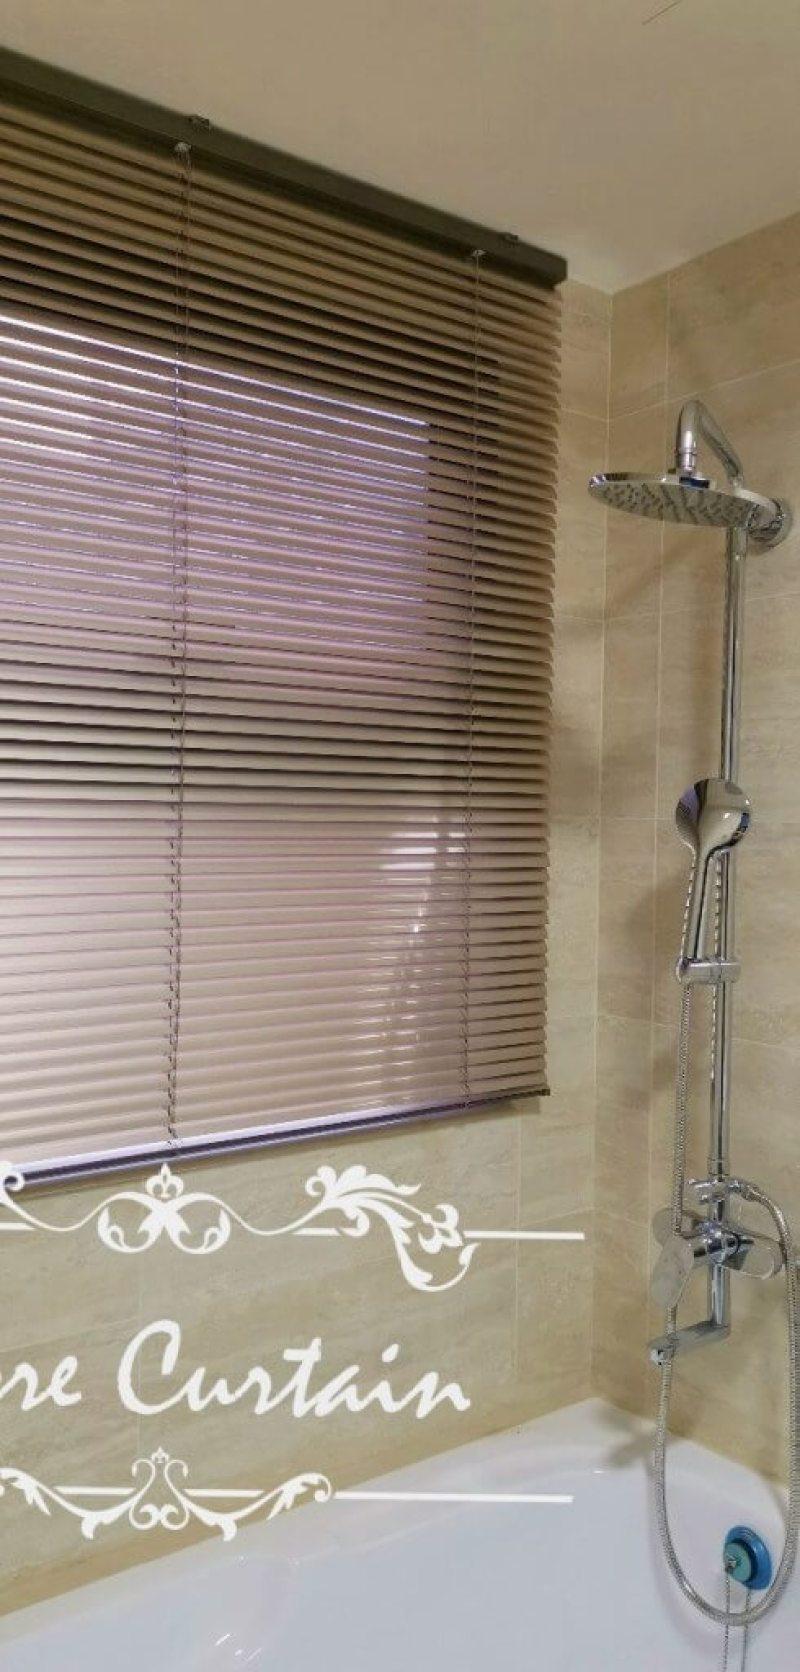 防水鋁百葉 浴室